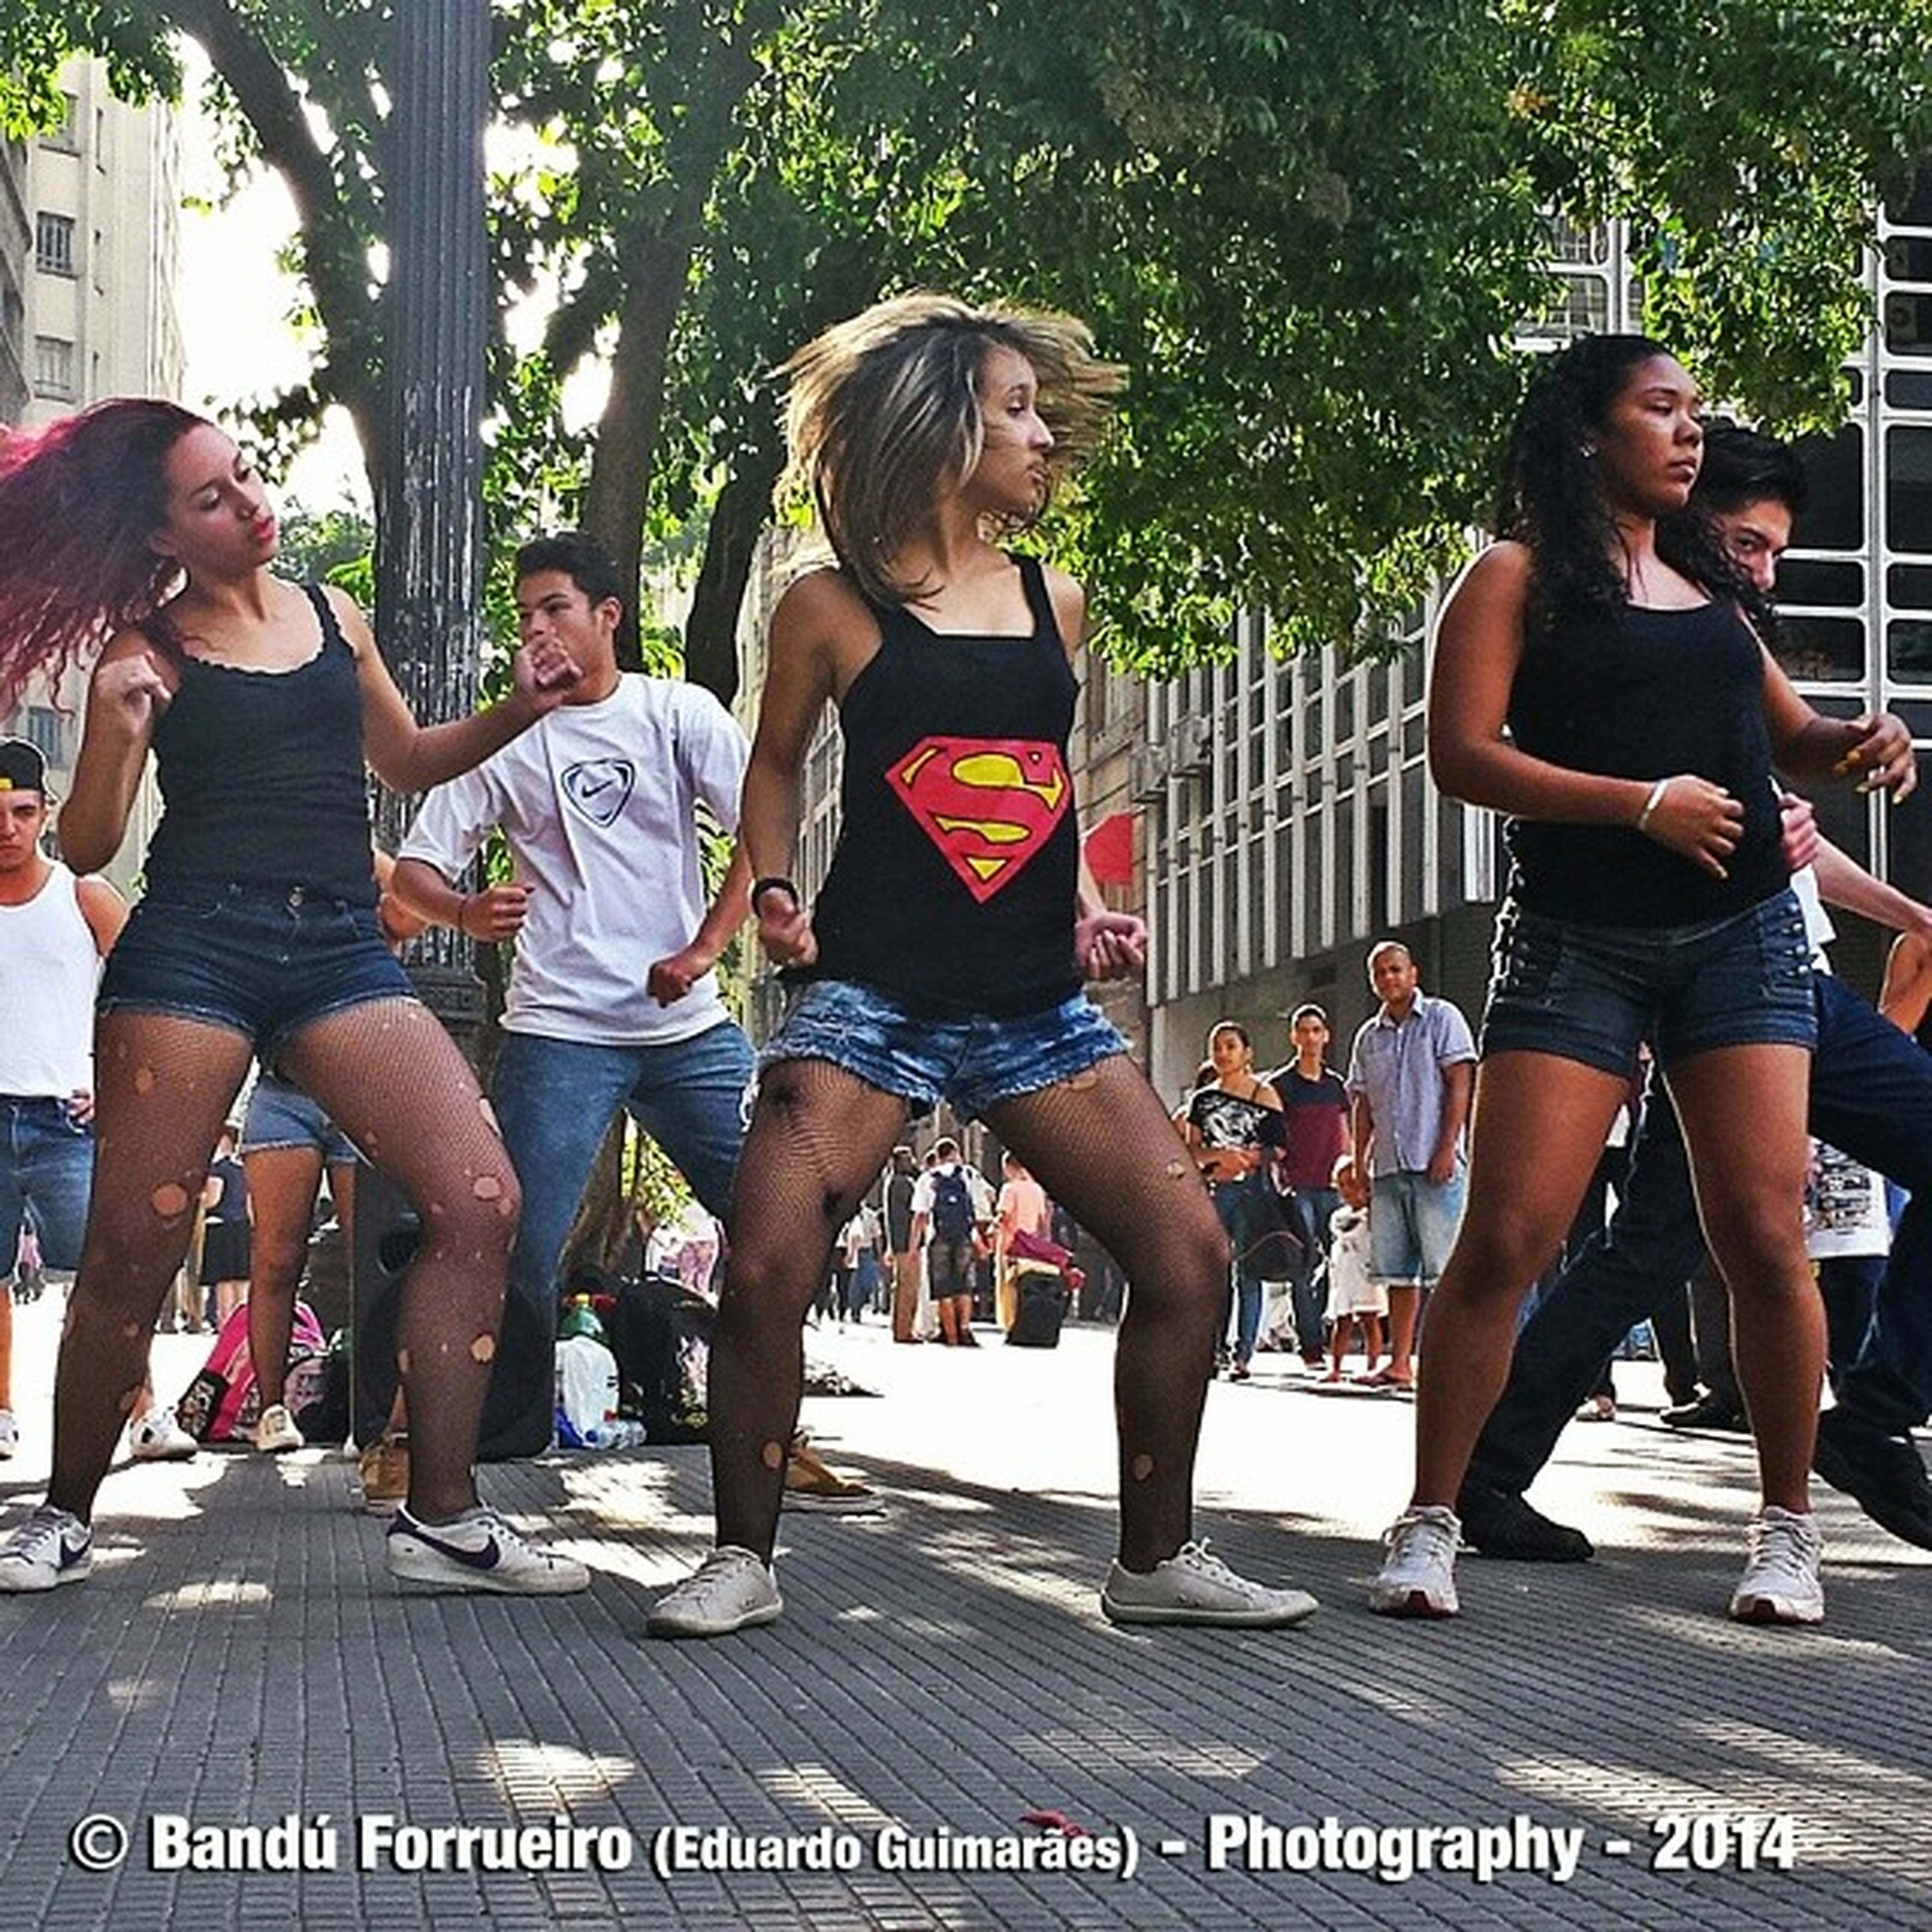 Dança de rua... Dancaderua Amostradedanca Fotografia Fotografiaderua fotododia color colors SP cidadedesaopaulo mobile